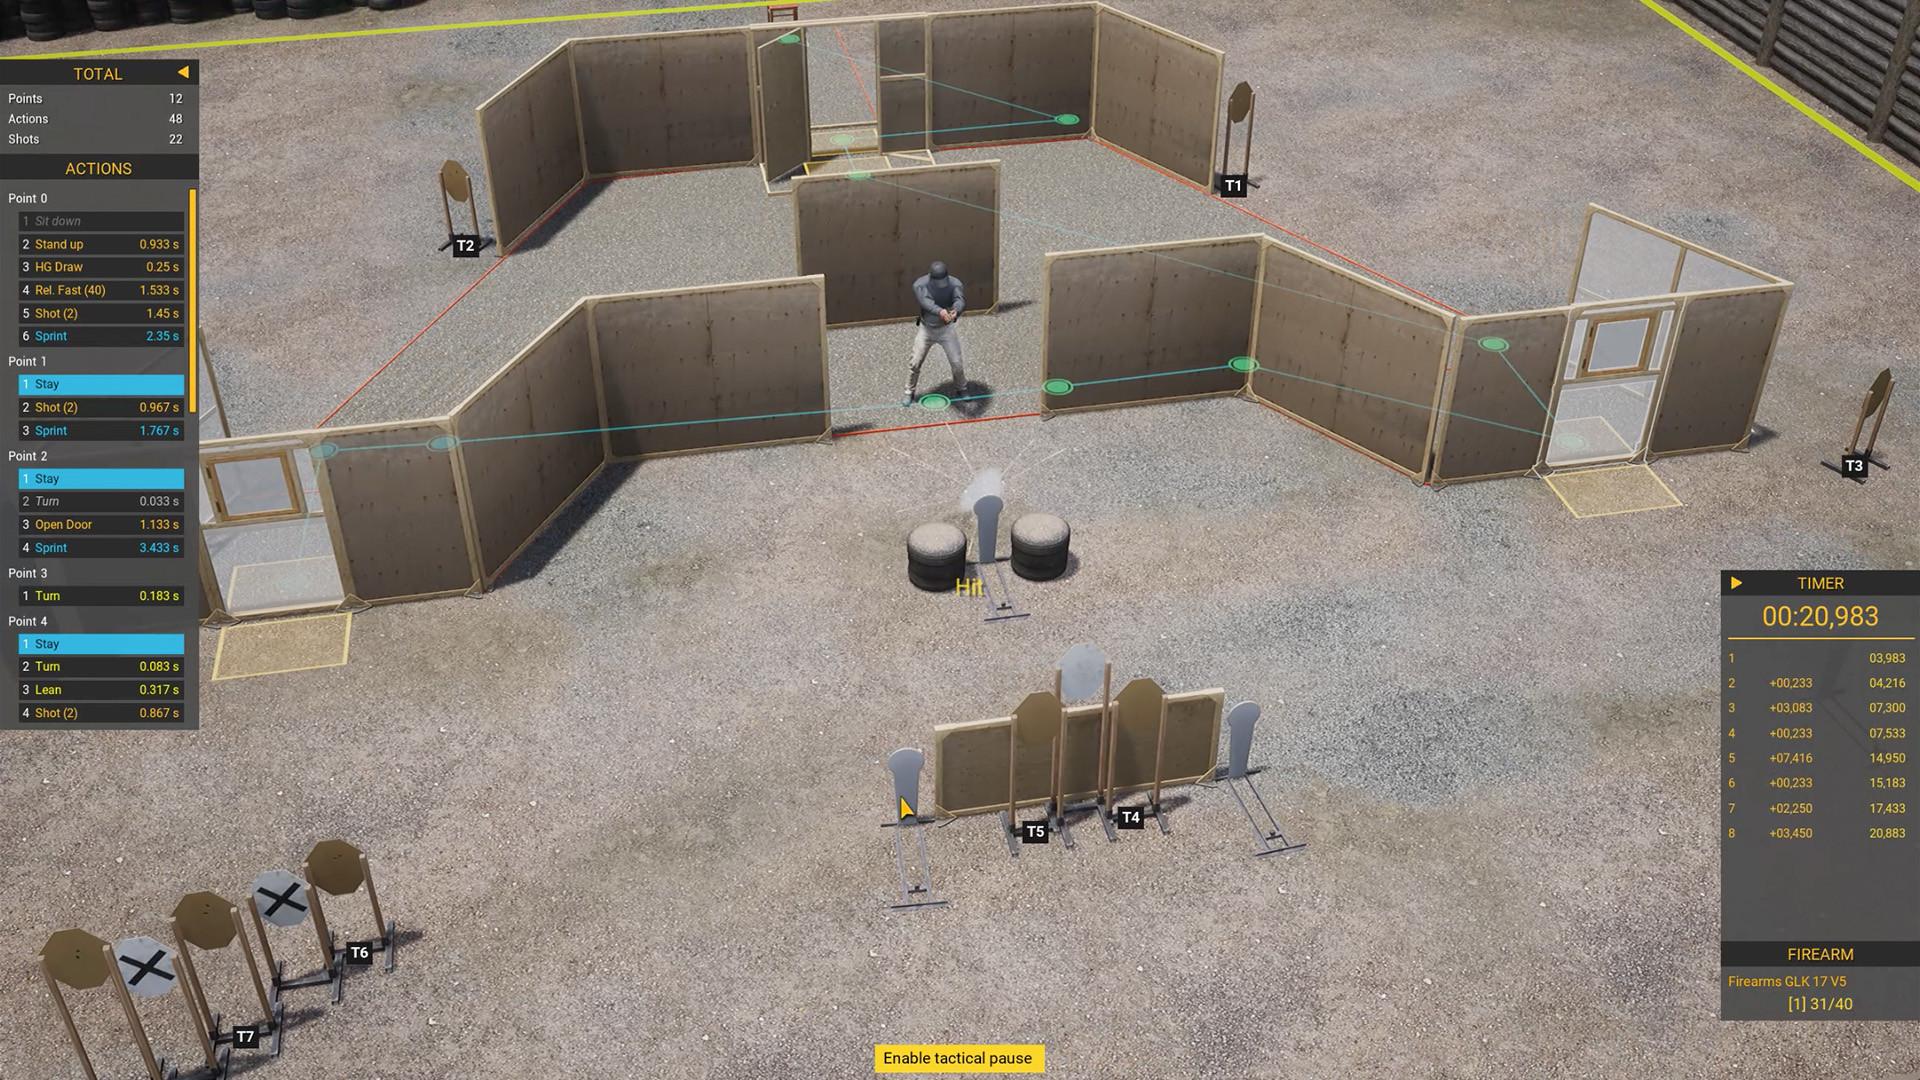 Practical Shooting Simulator Free Download